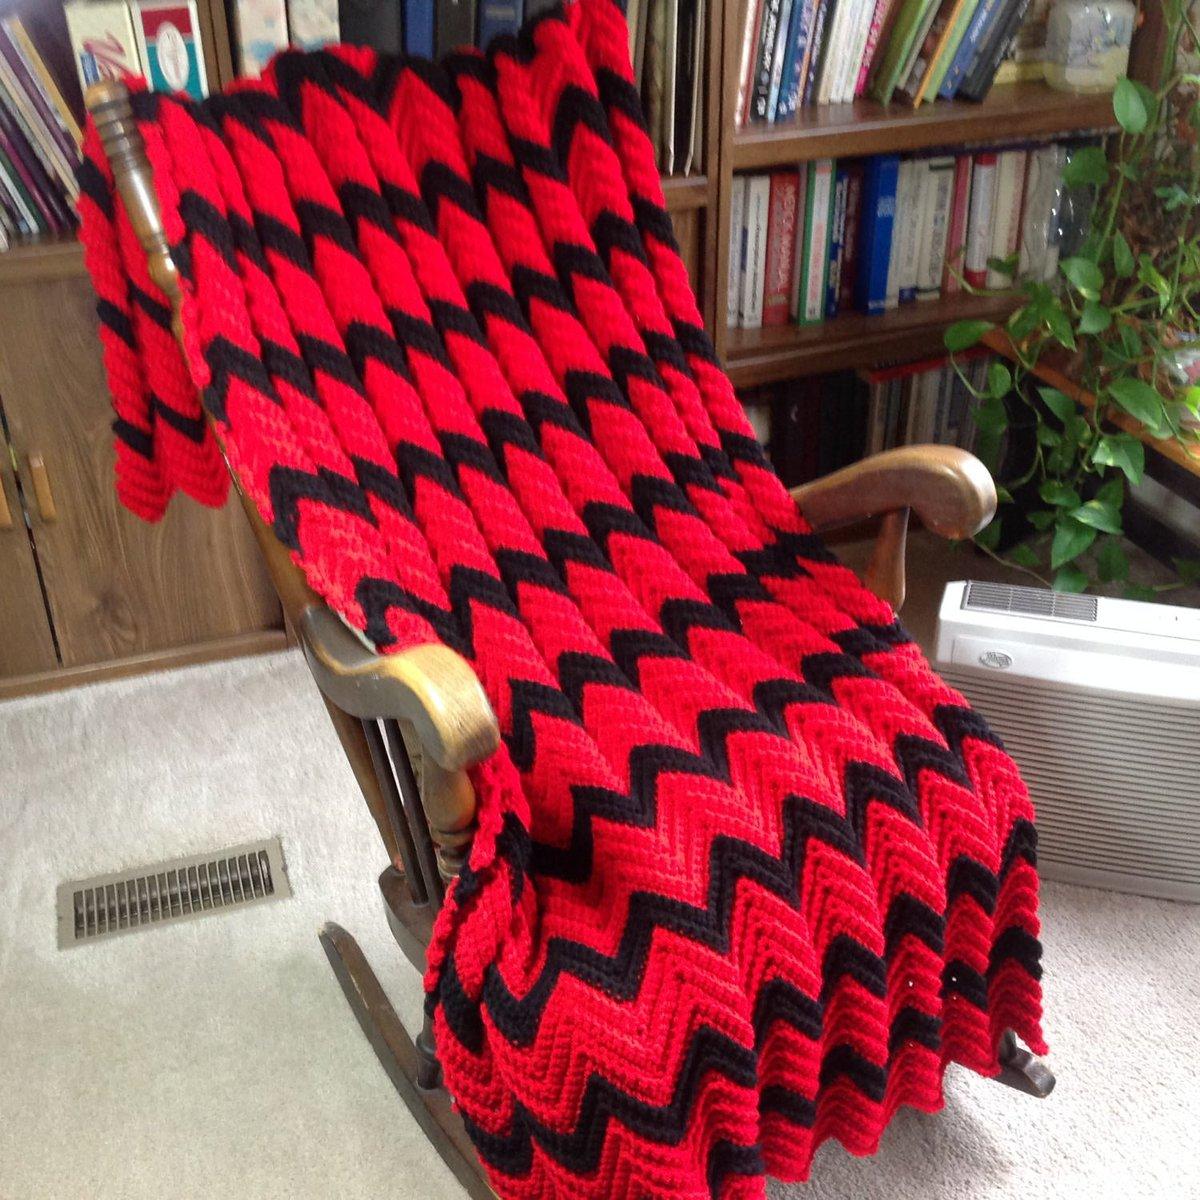 Red & Black Chevron Pattern Afghan/Throw/Blanket_Hand Crocheted_School/Team Colors_Dorm Decor_Grad Gift_Machine Wash_Free Ship_Made in USA  http:// tuppu.net/f9a4fb11     #Etsy #YarnQueens #MadeInUsa <br>http://pic.twitter.com/JK8PHqquIR